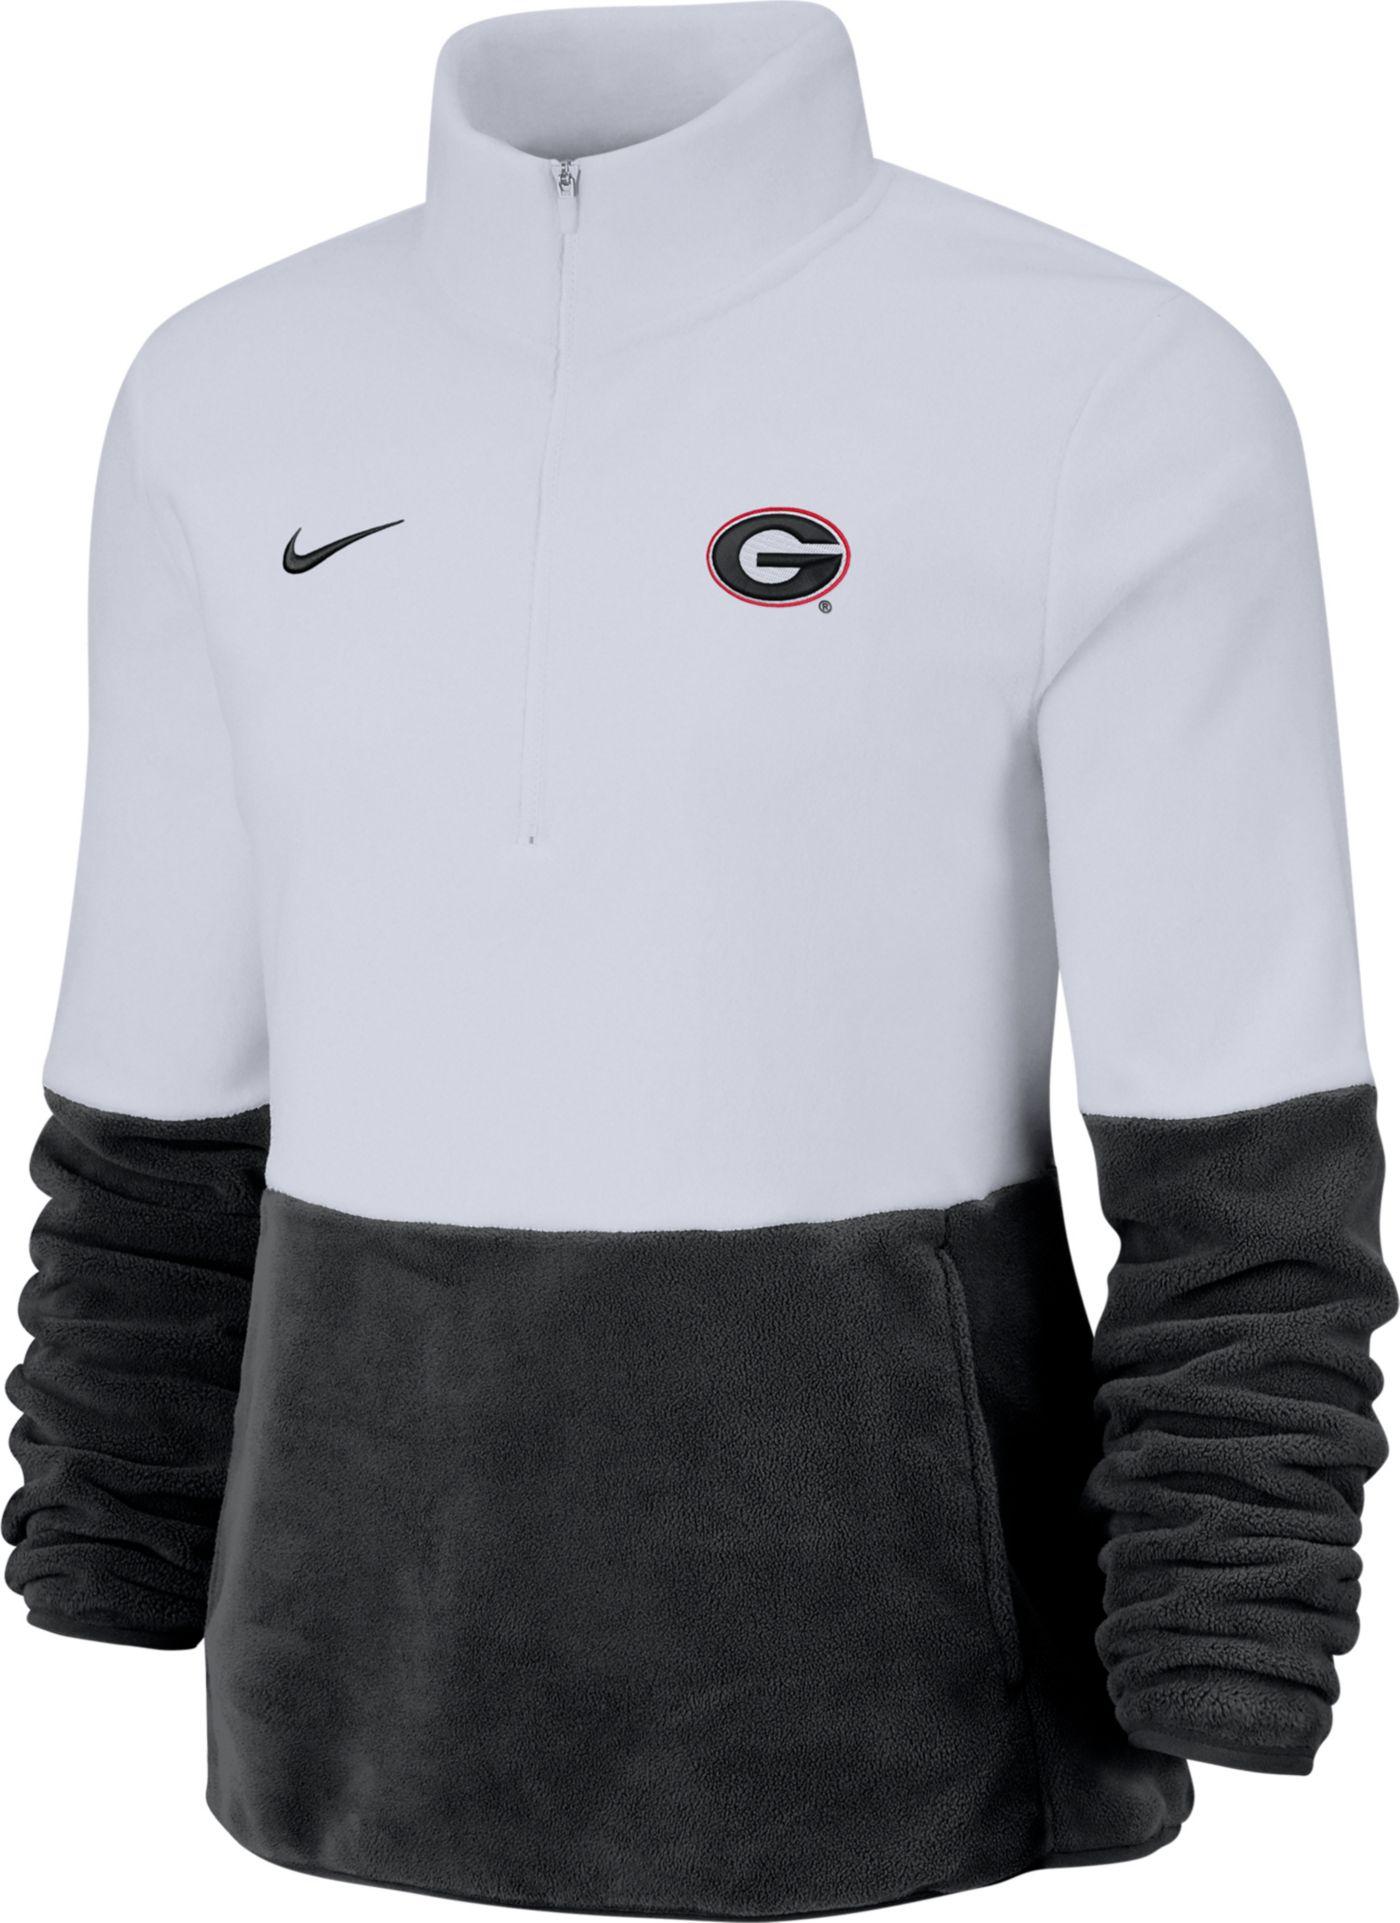 Nike Women's Georgia Bulldogs Cozy Therma White Half-Zip Fleece